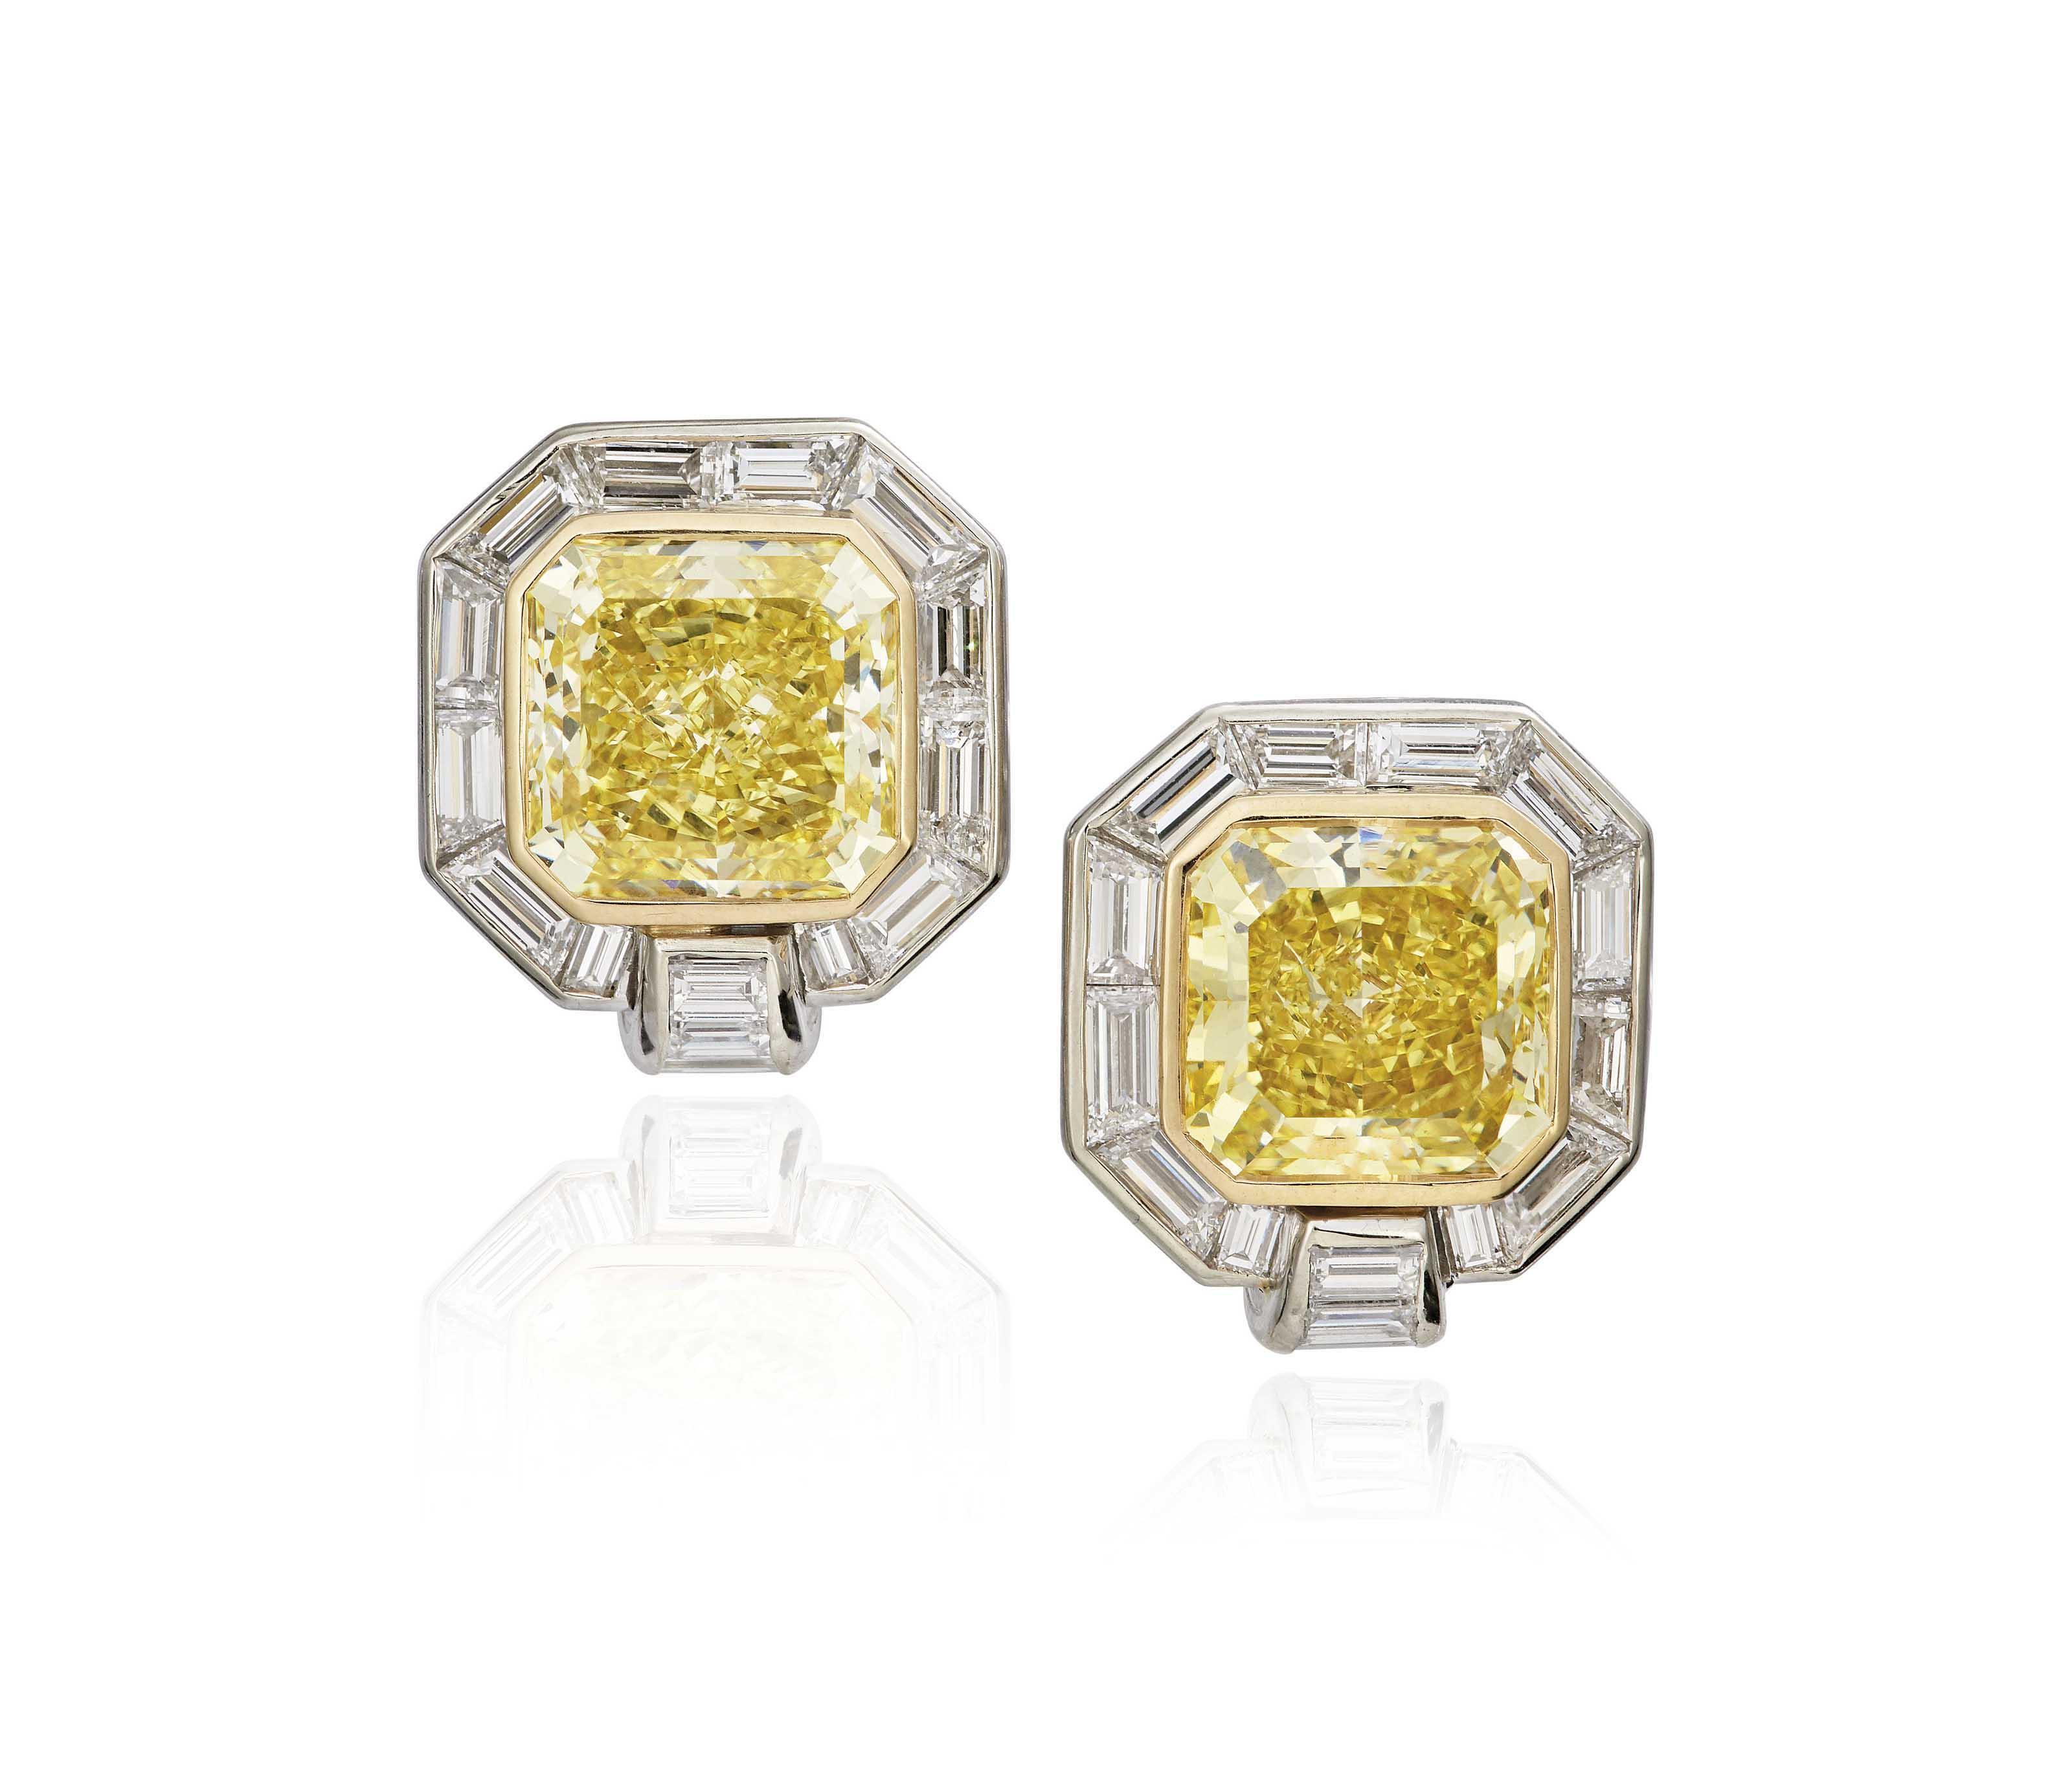 A PAIR OF DIAMOND AND COLOURED DIAMOND EARRINGS, BY ADLER